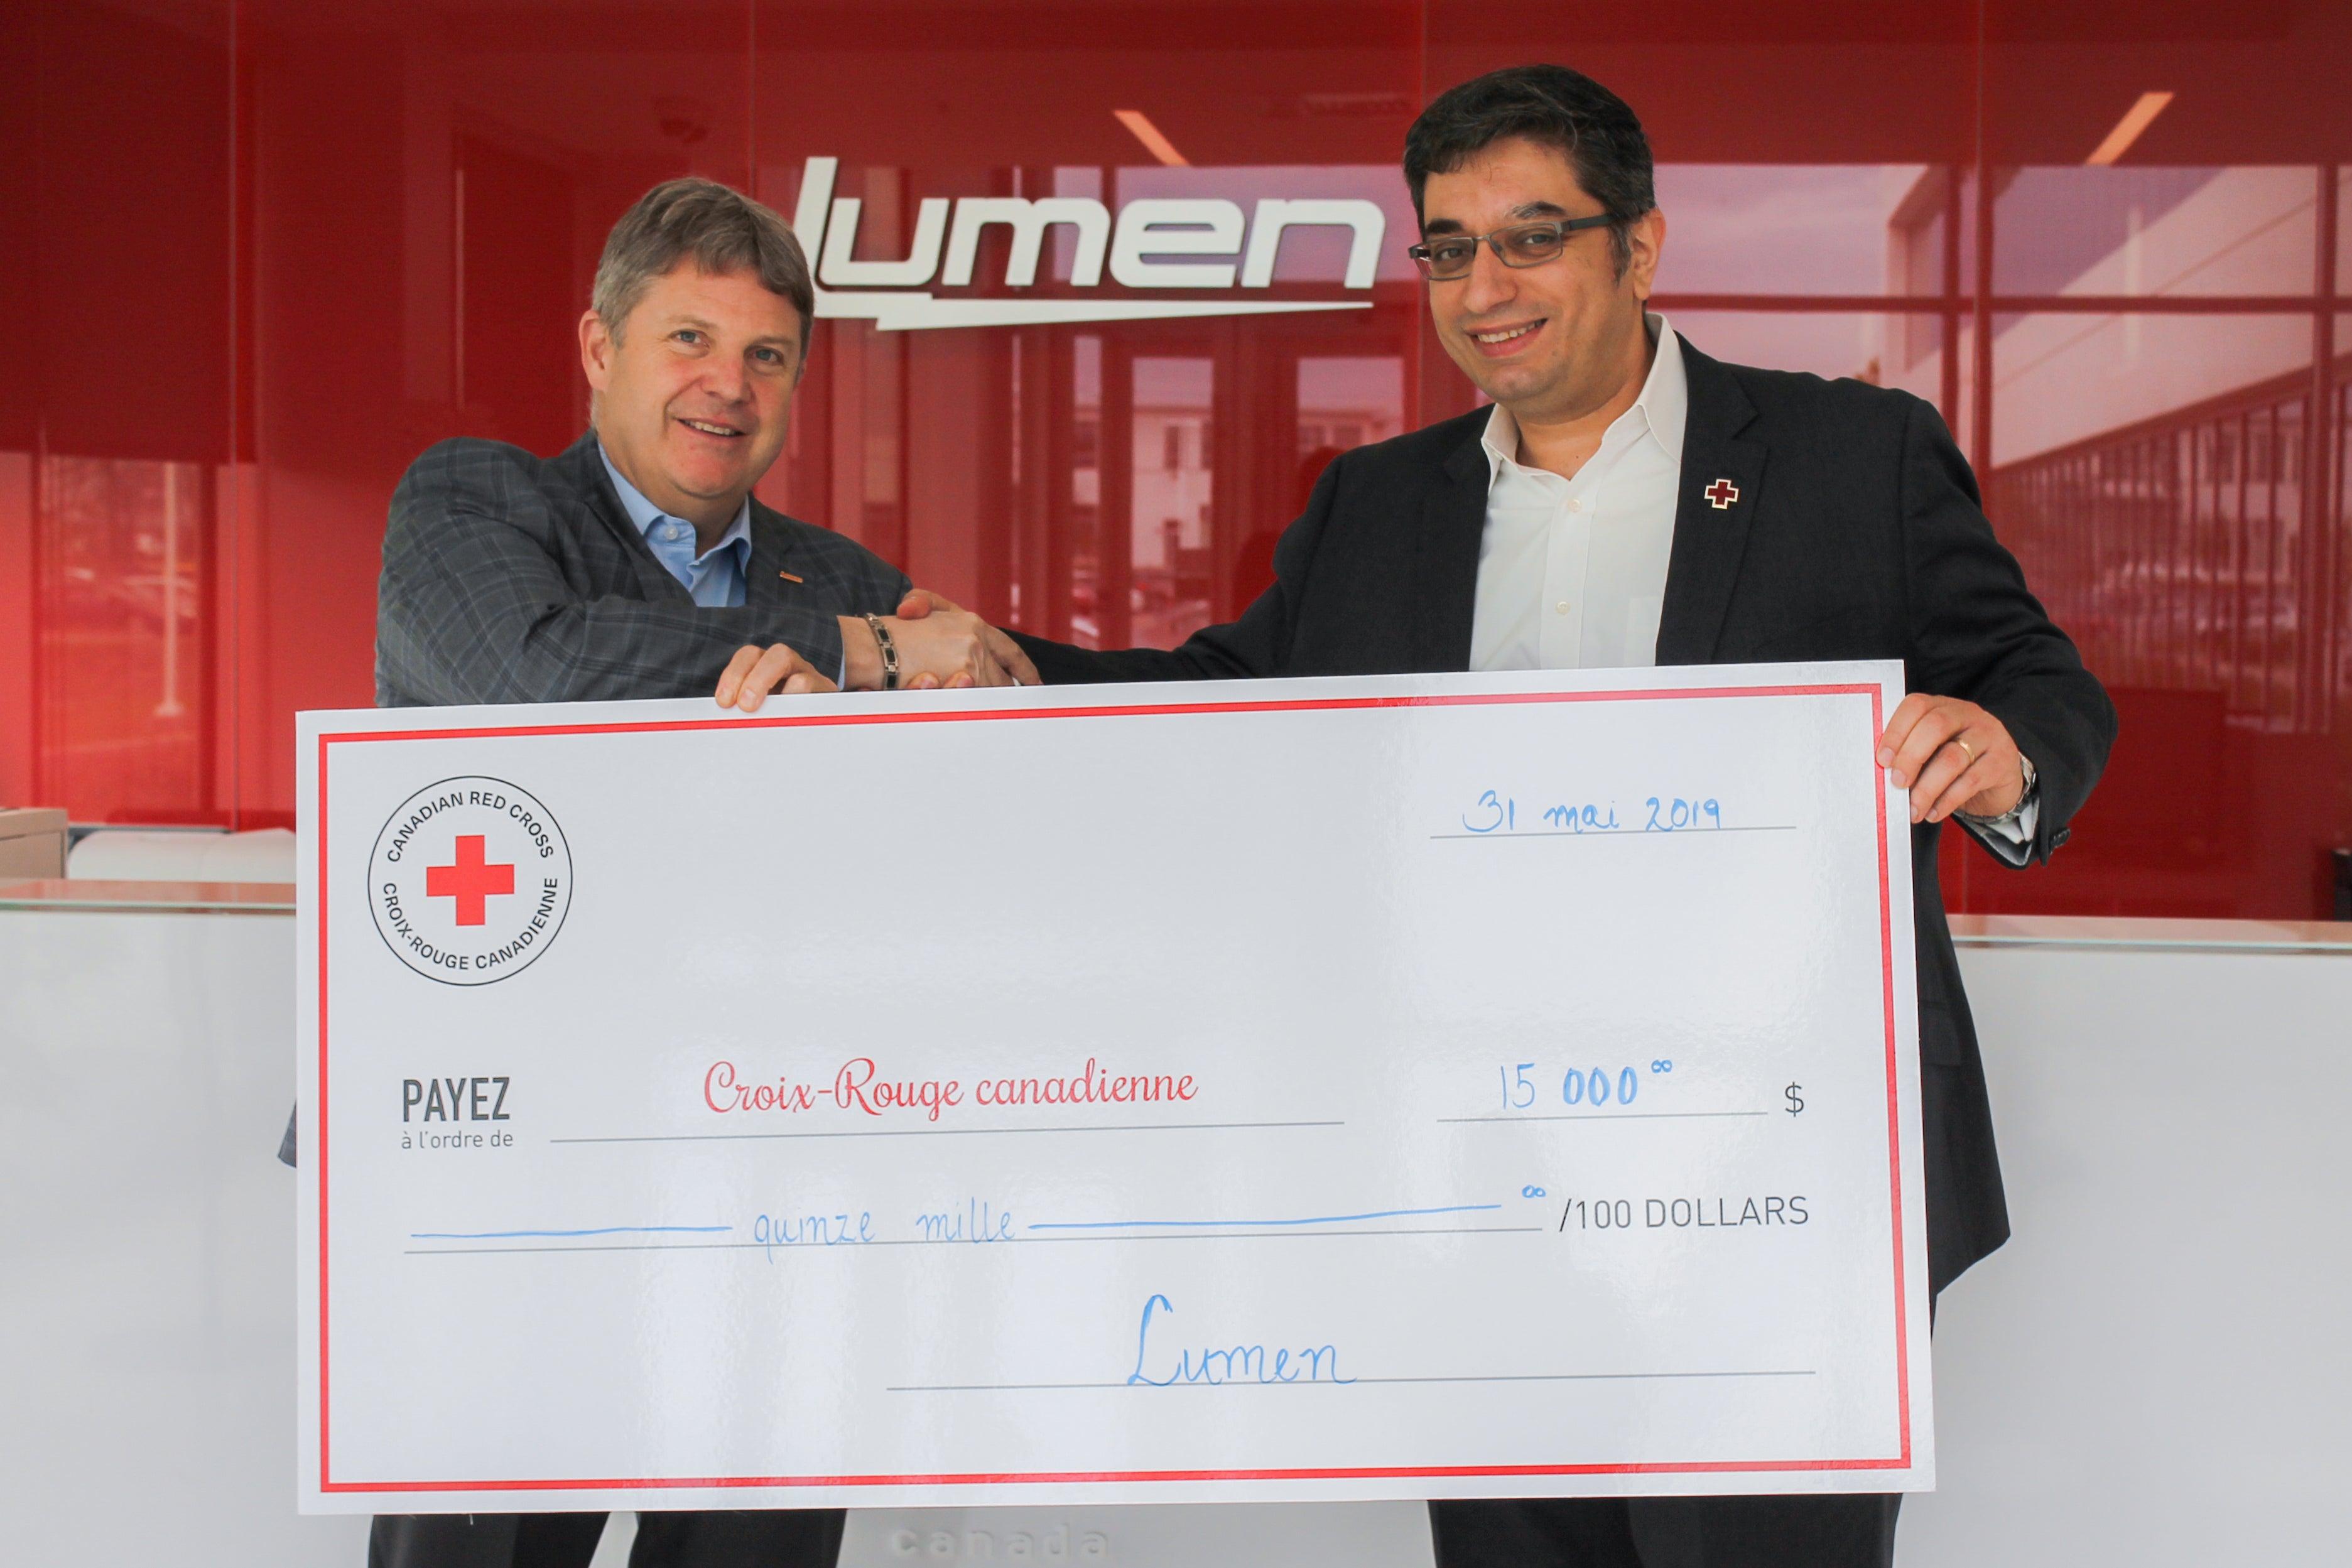 Lumen Raises 15,000$ in Donations for Recent Floods